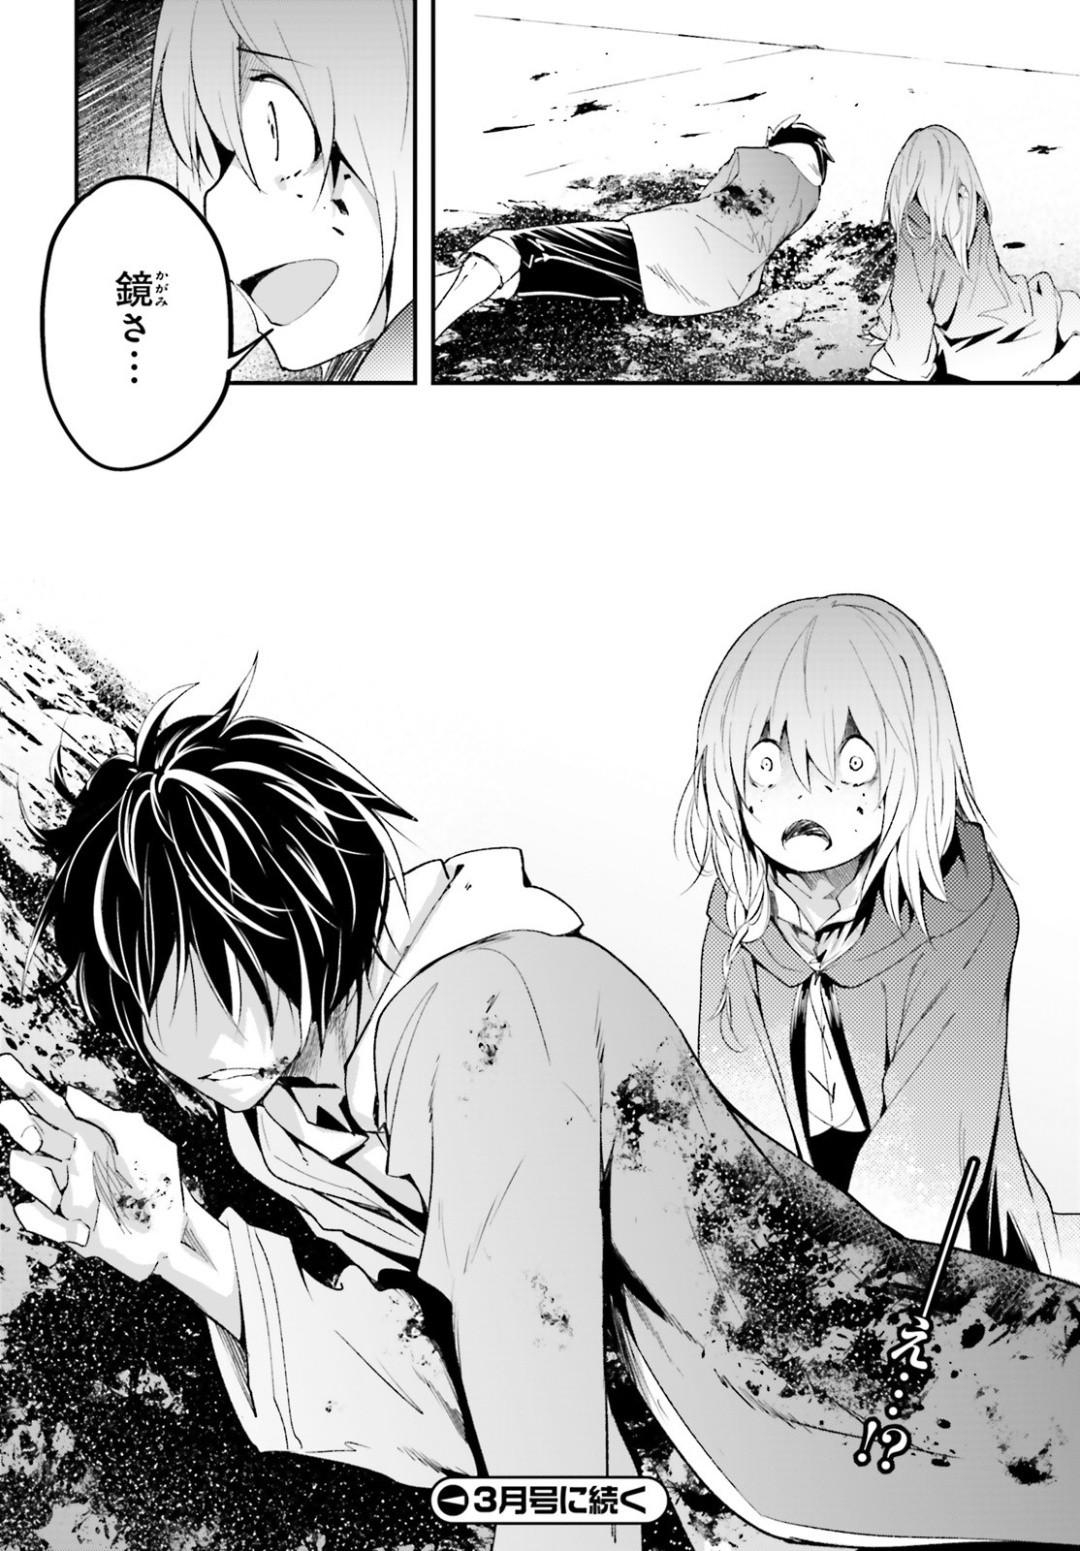 Youjo Senki - Chapter 52 - Page 1